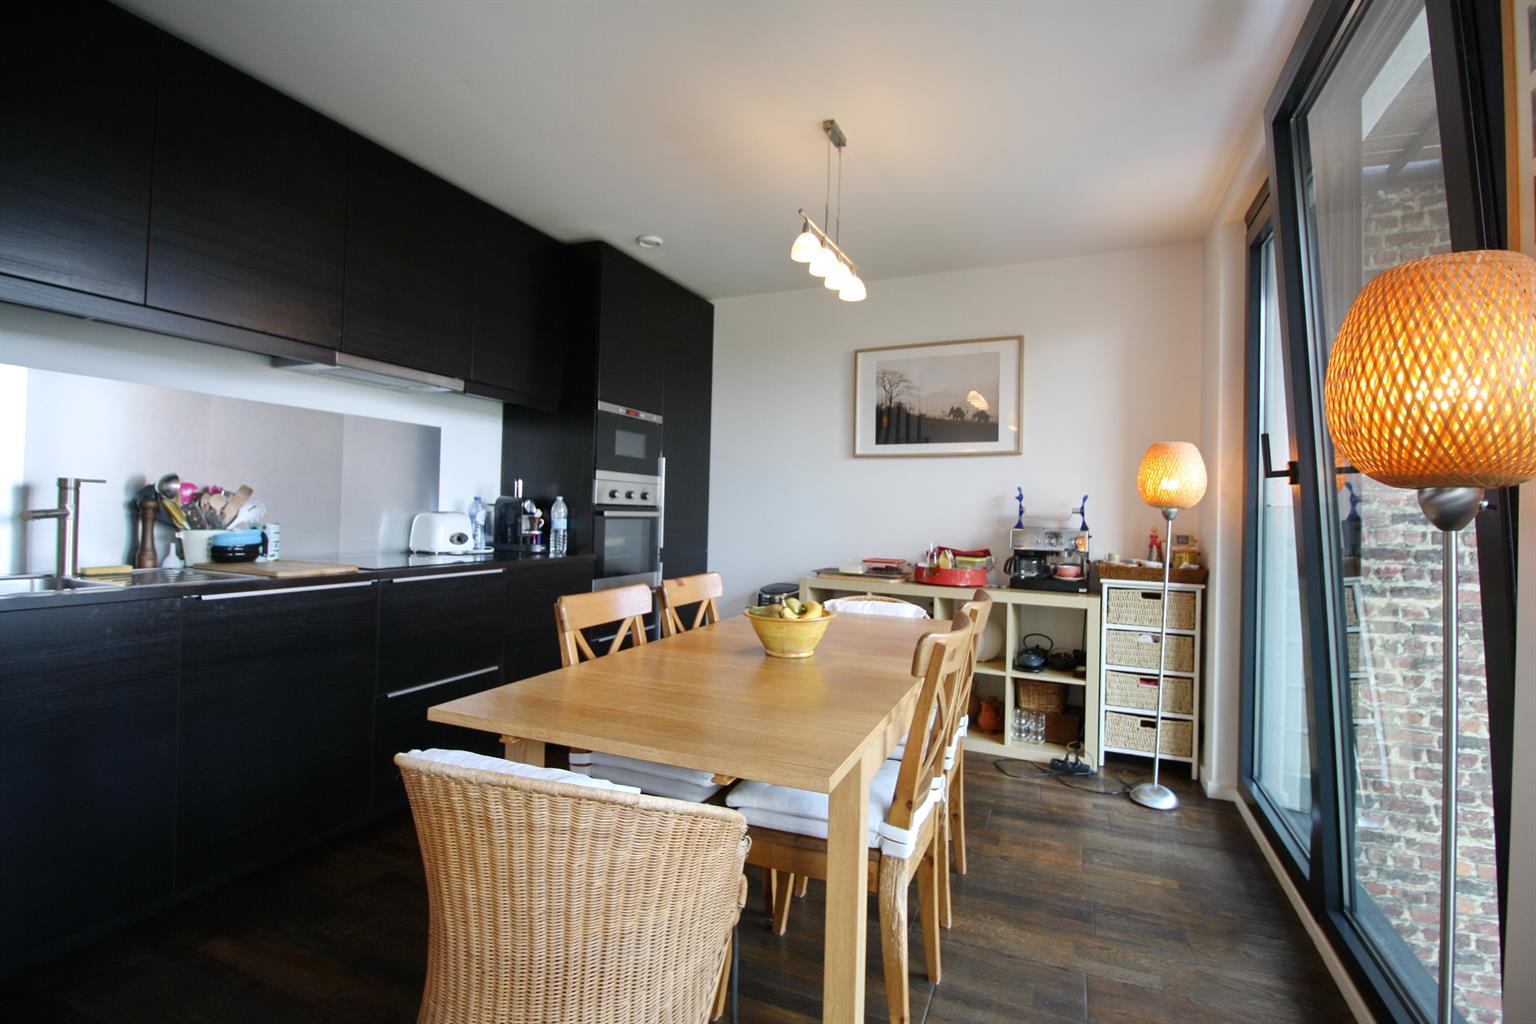 Penthouse - Berchem-Sainte-Agathe - #4346071-8